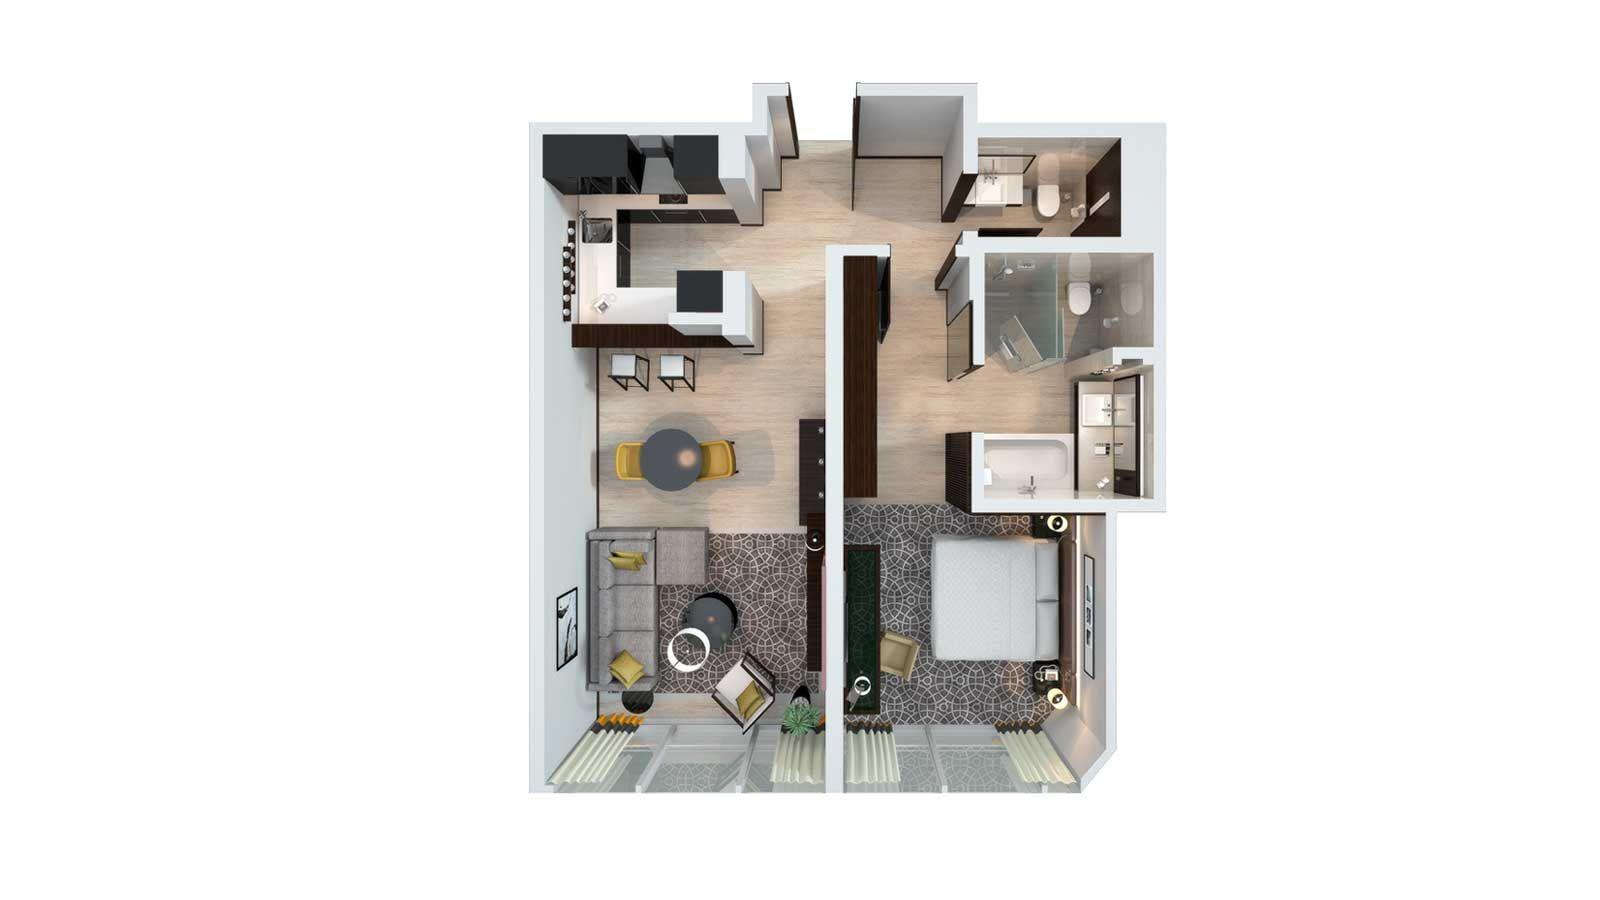 1, 2 and 3 bedroom hotel apartments | sheraton grand hotel, dubai